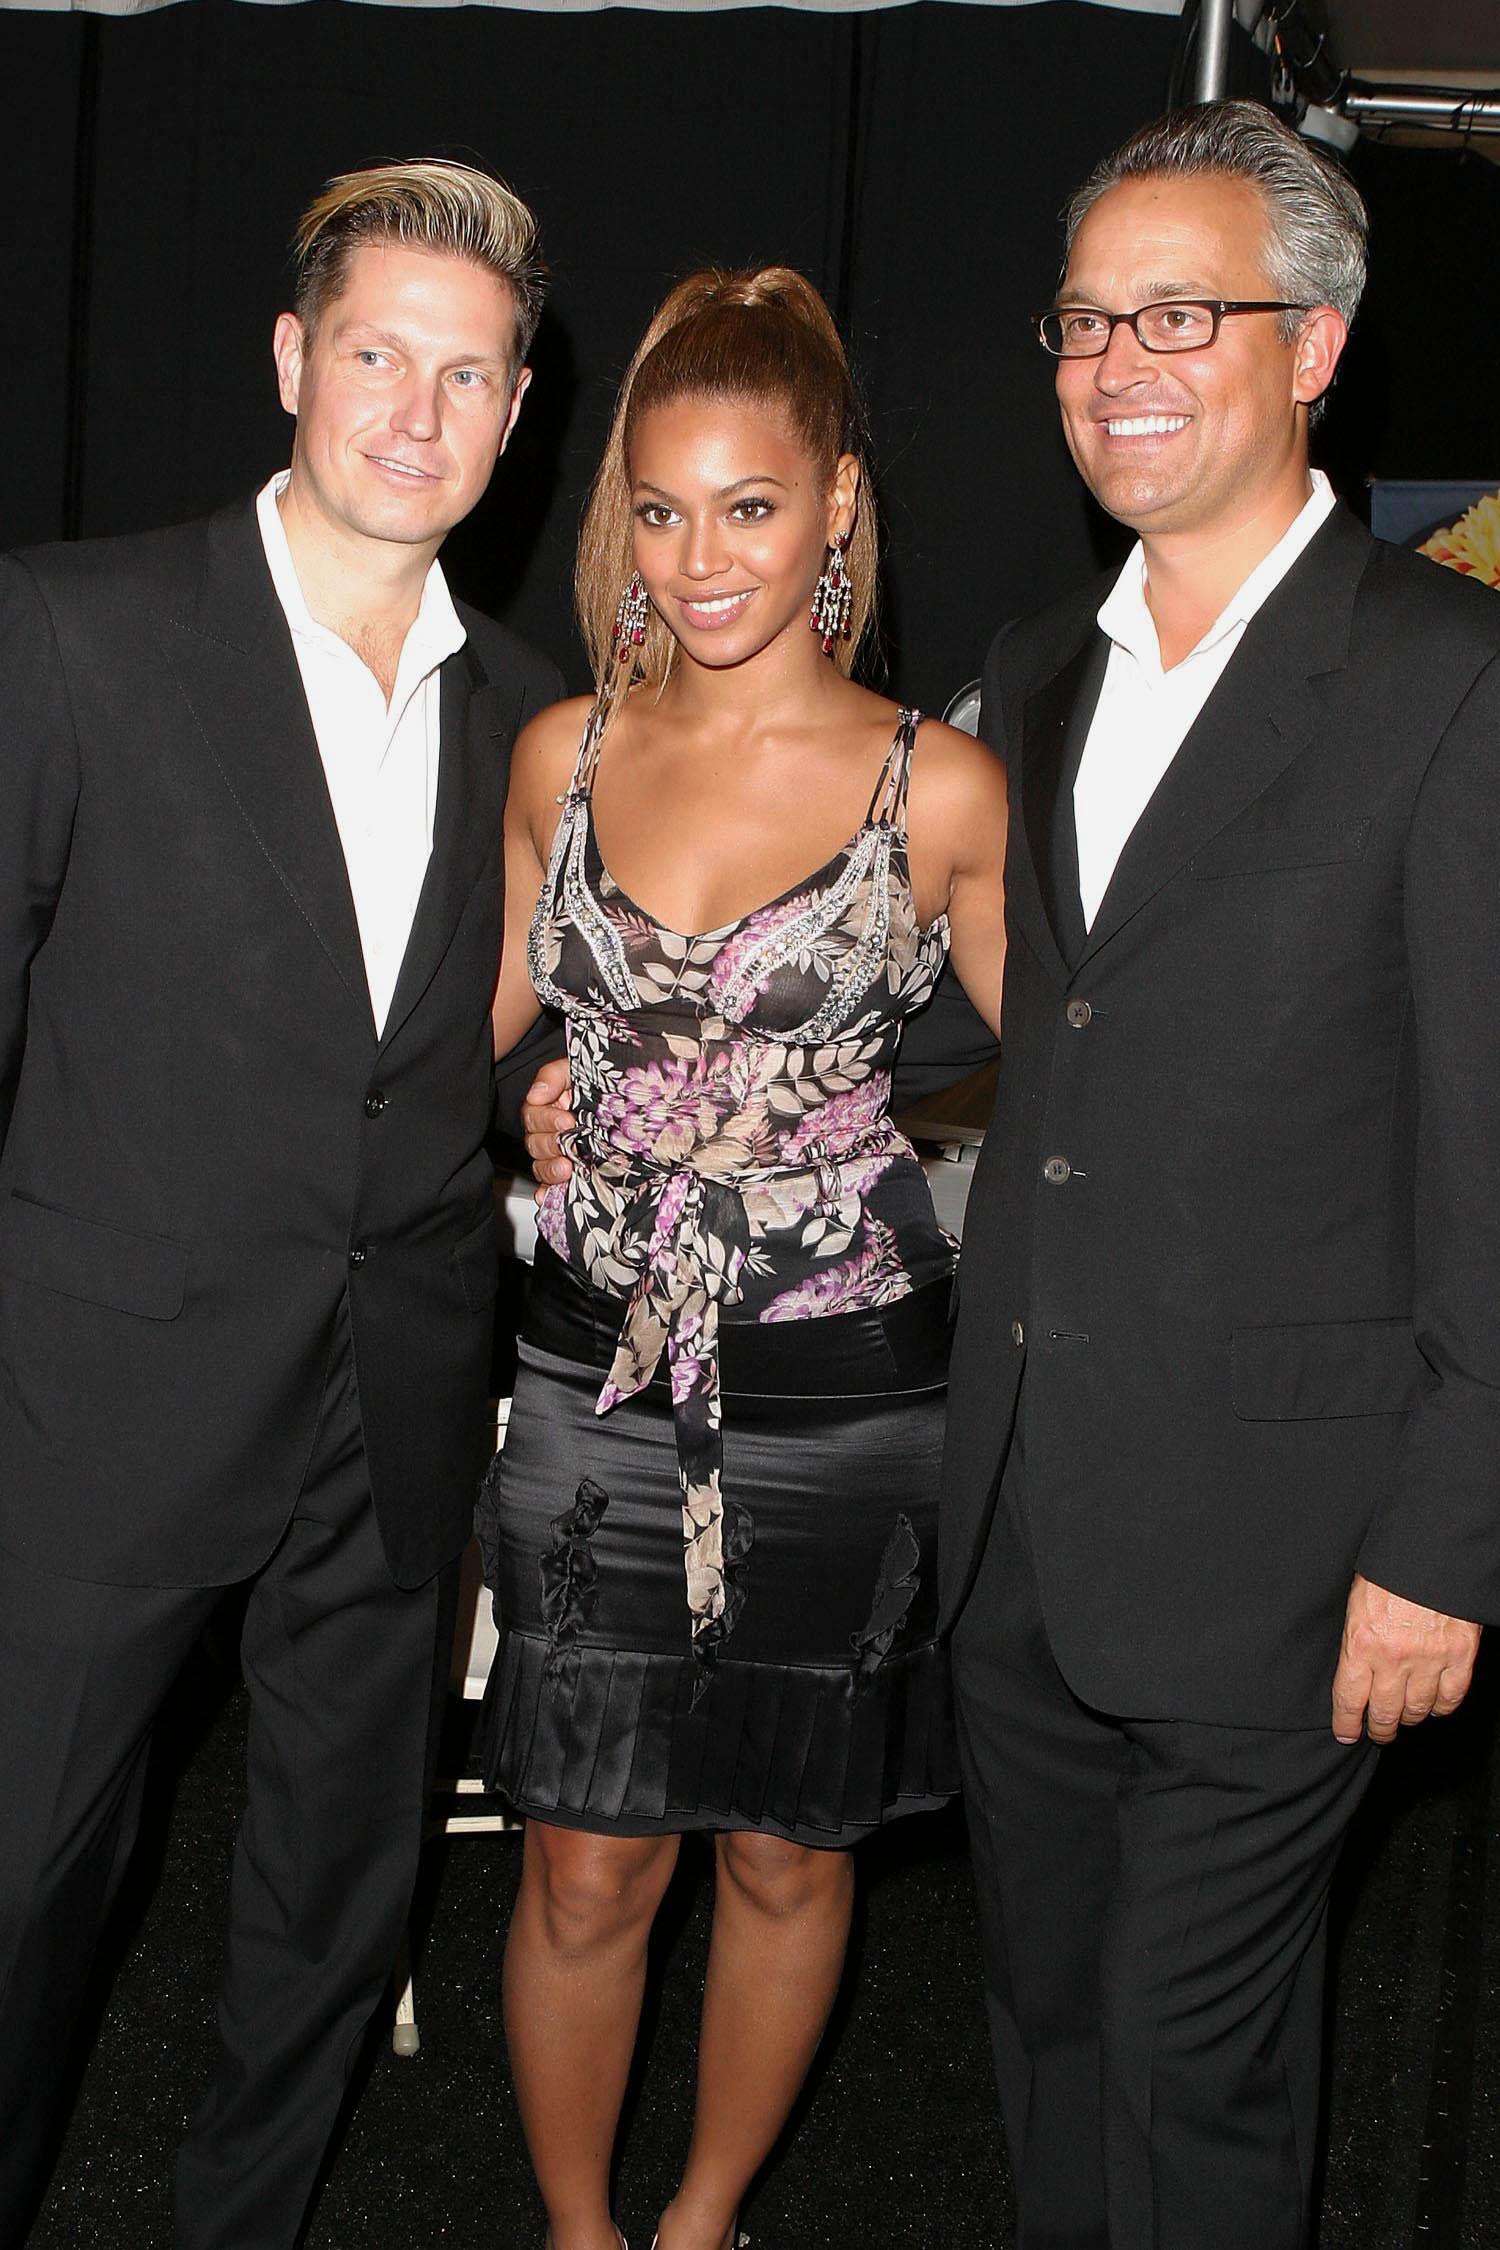 Beyoncé at Fashion Week Photos